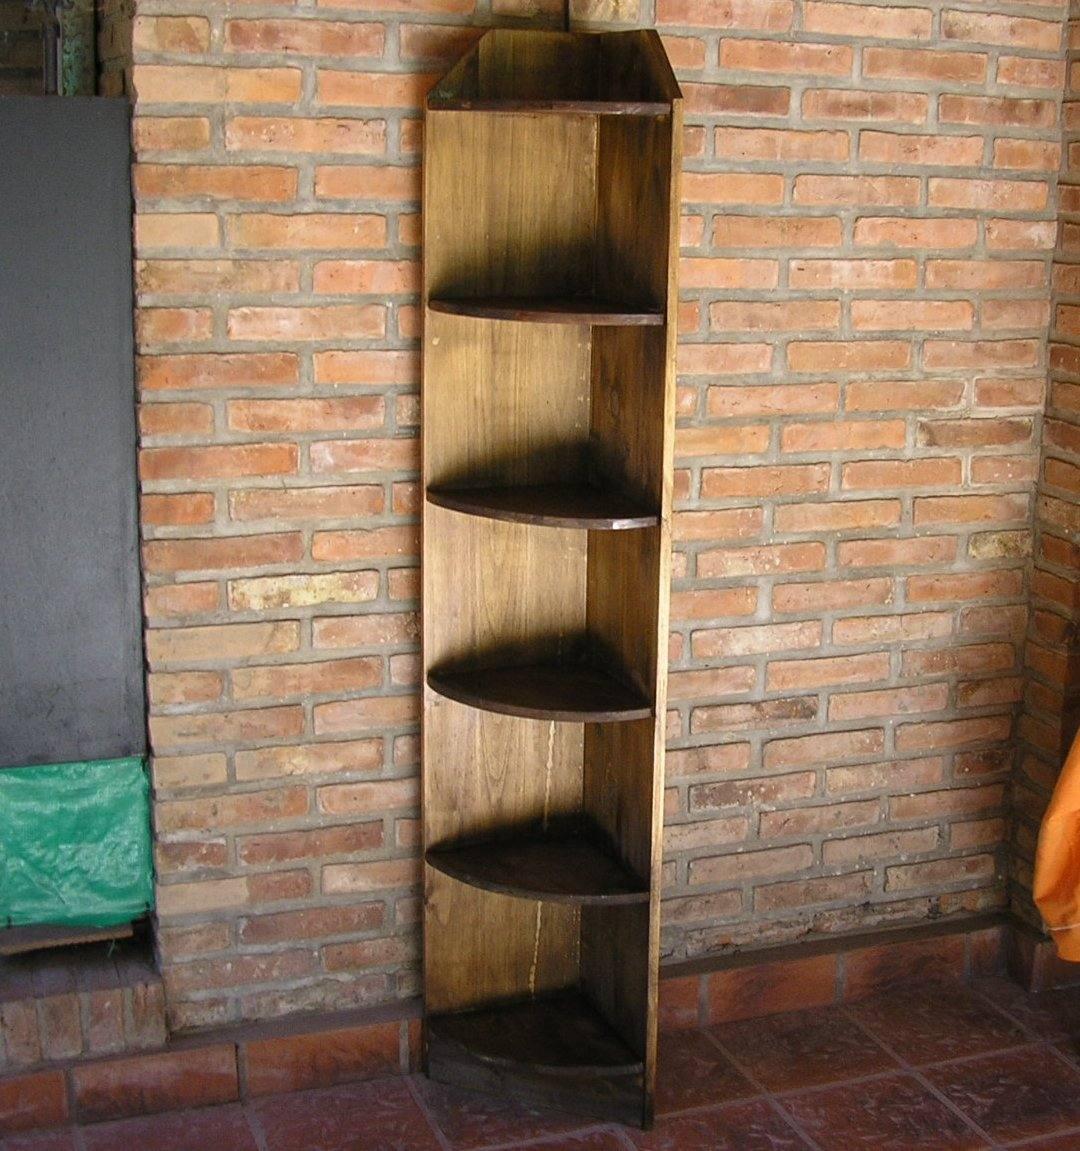 Mercadolibre Mueble Esquinero Para Bano Cddigi Com # Muebles Rinconera Bano